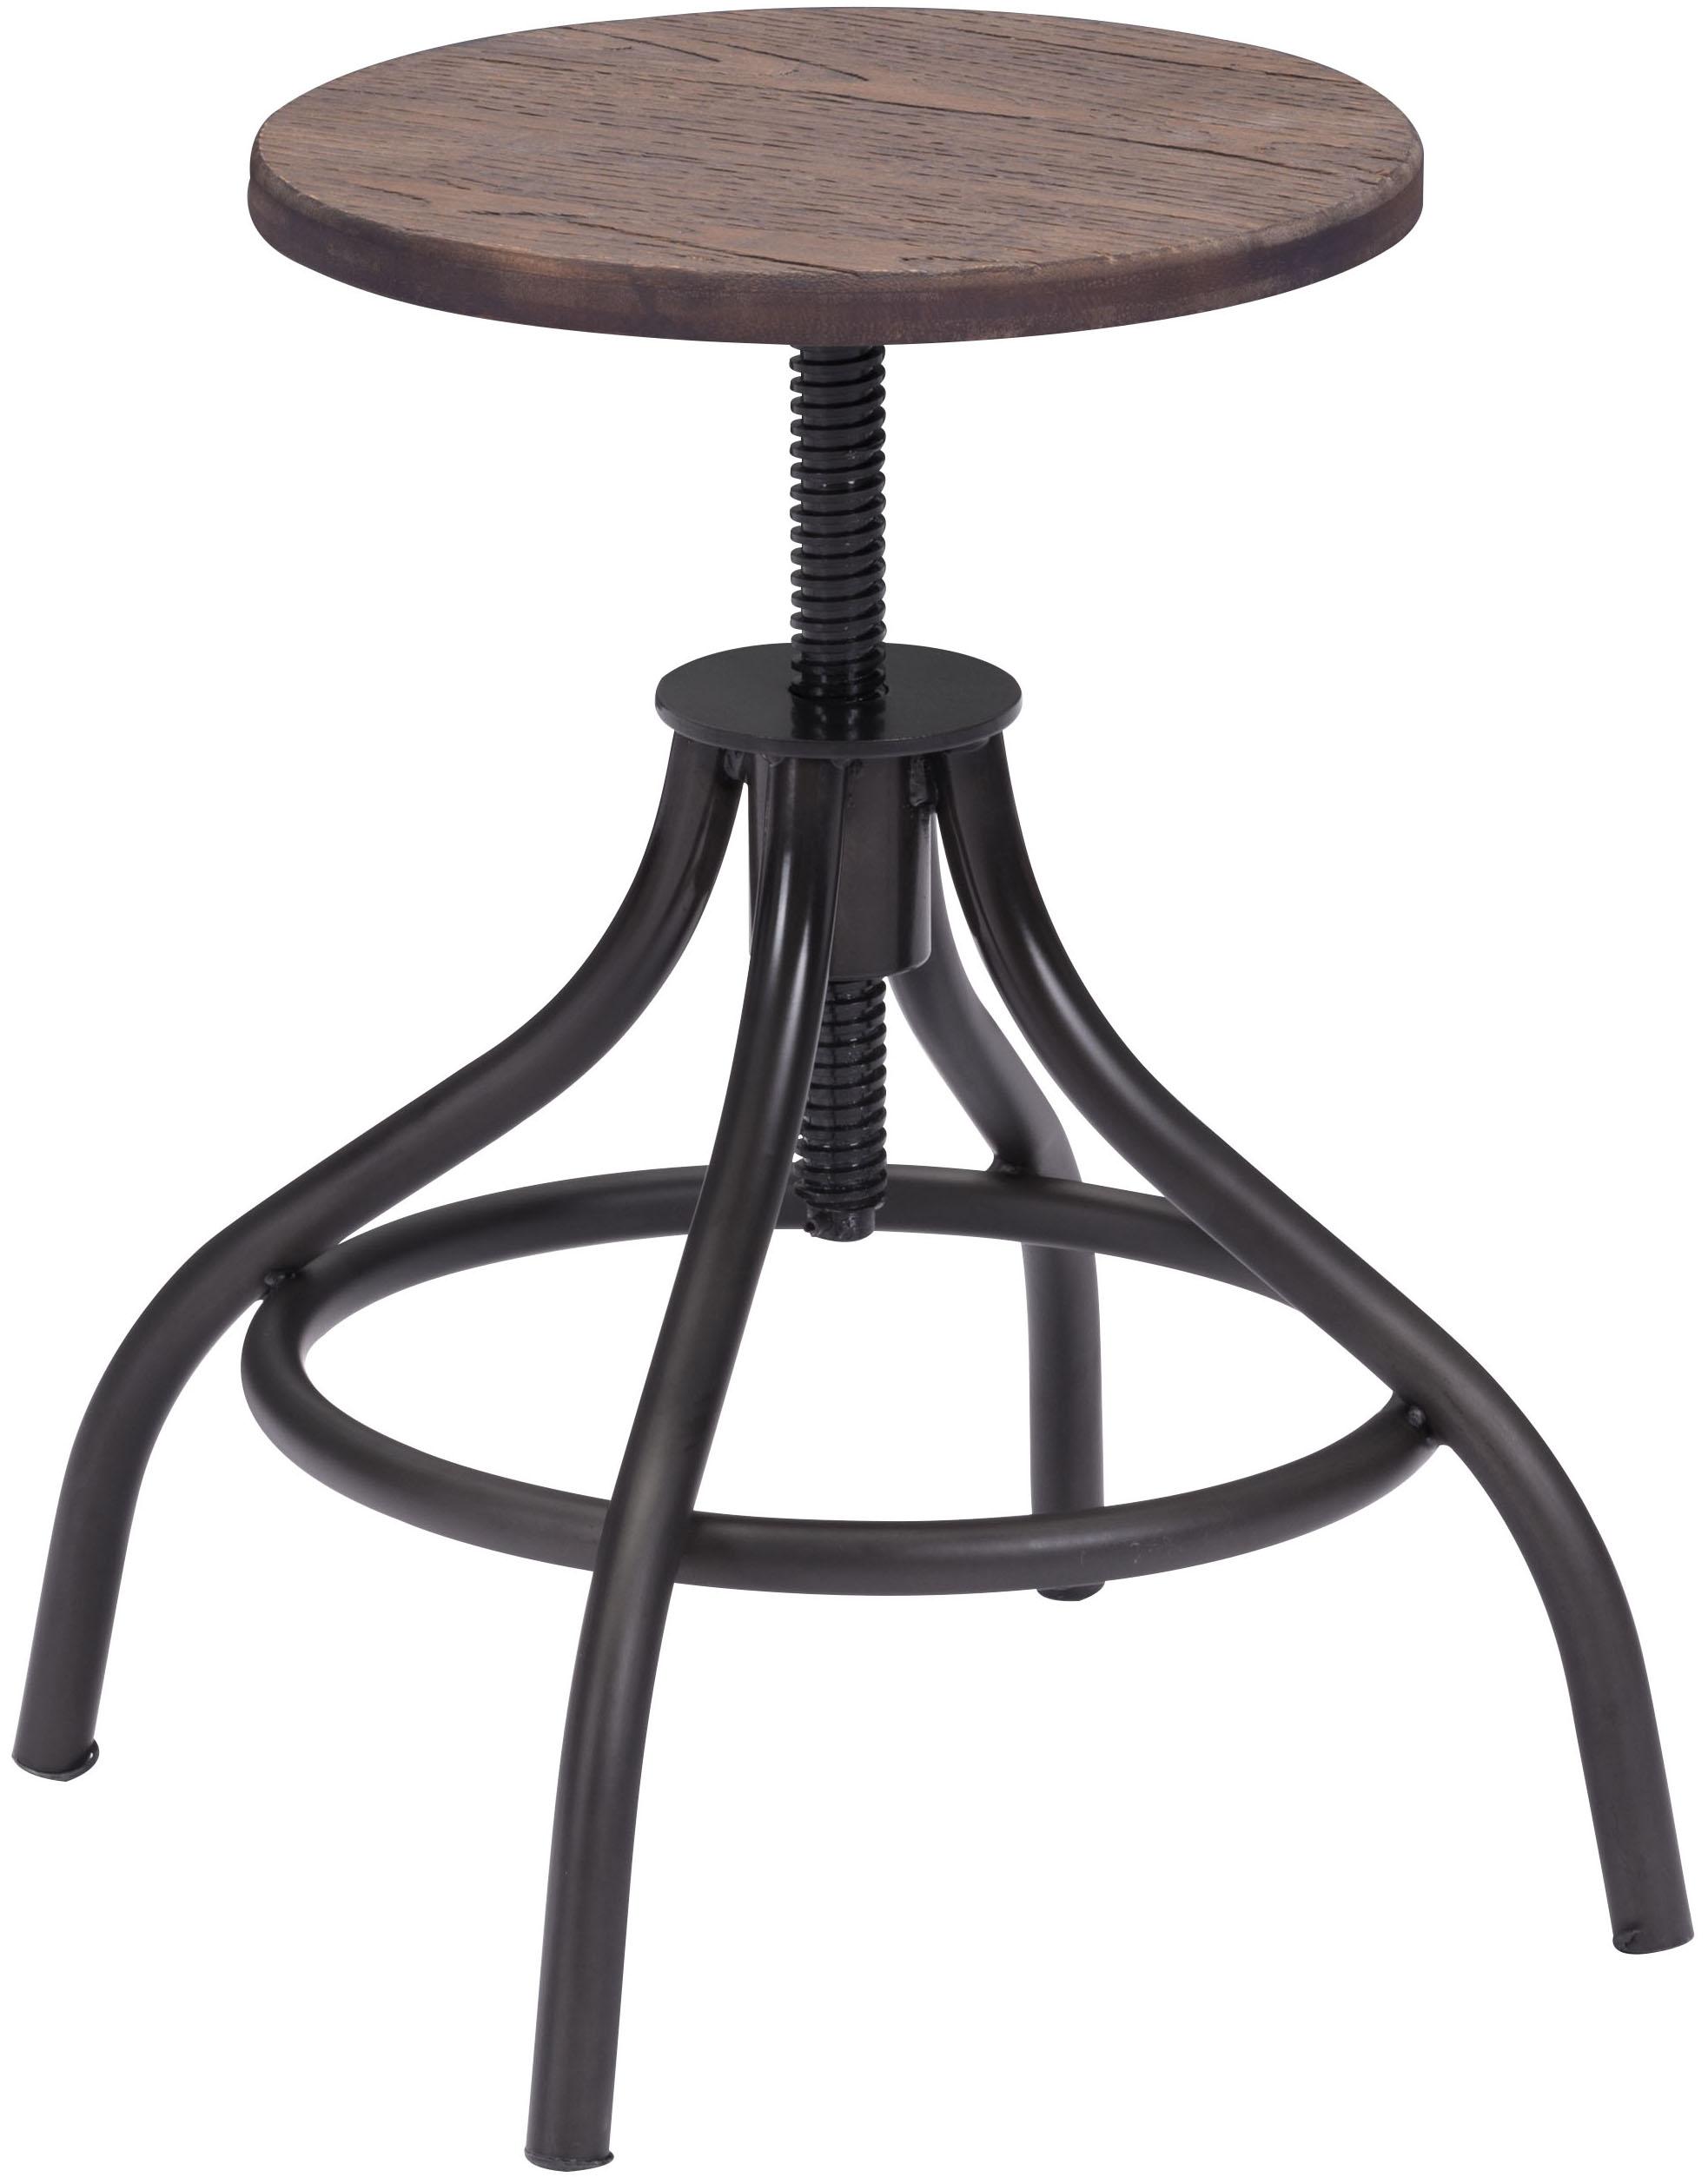 plato stool